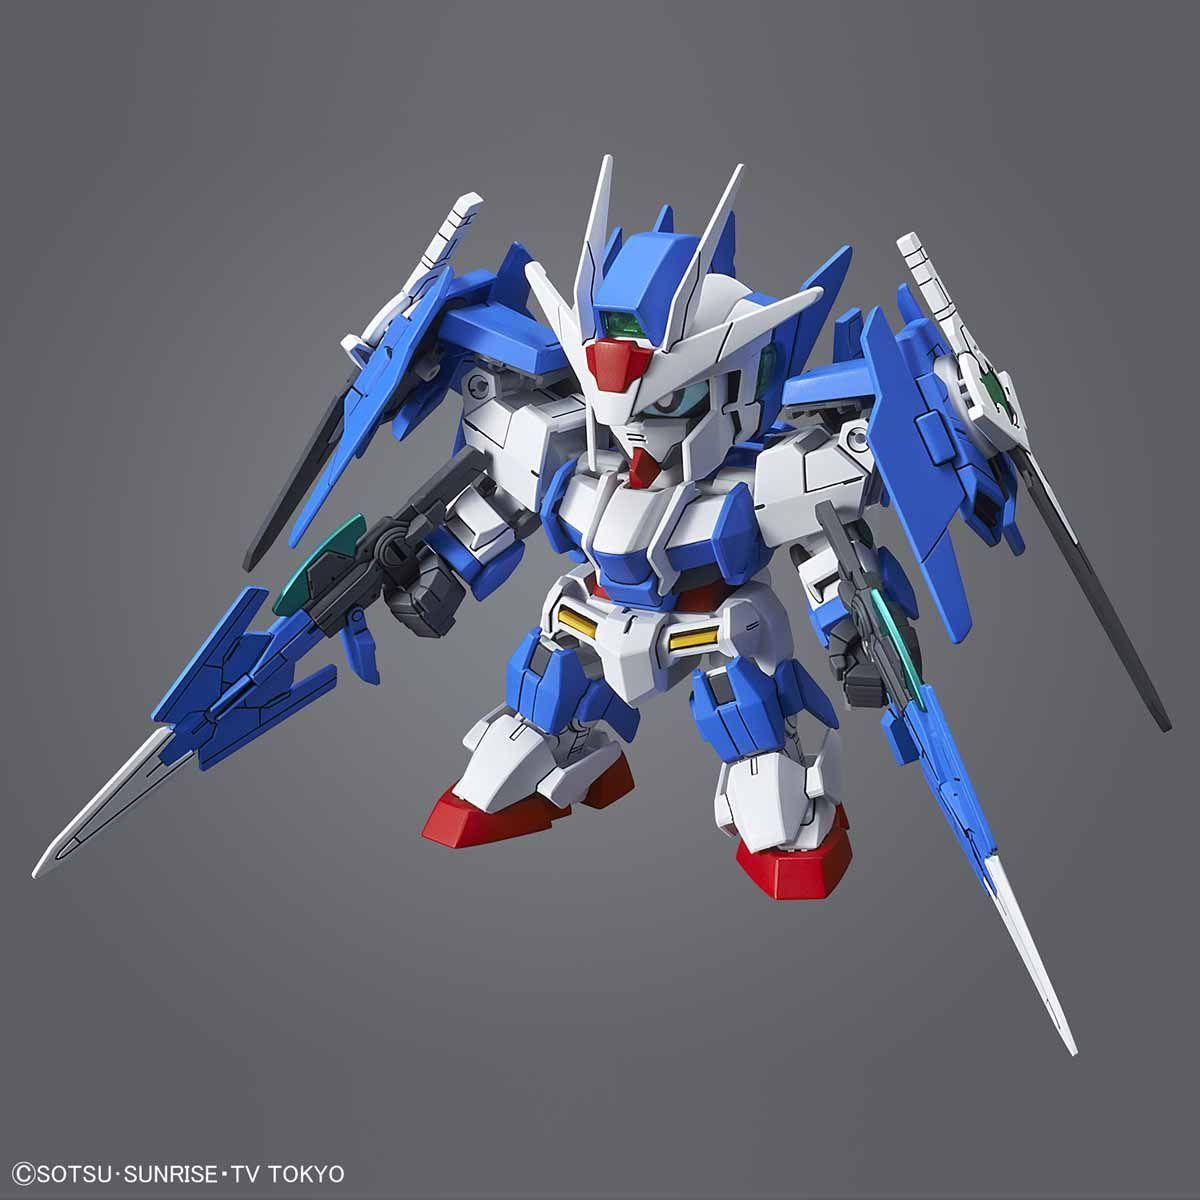 GN-0000DVR/A ガンダムダブルオーダイバーエース [Gundam 00 Diver Ace]